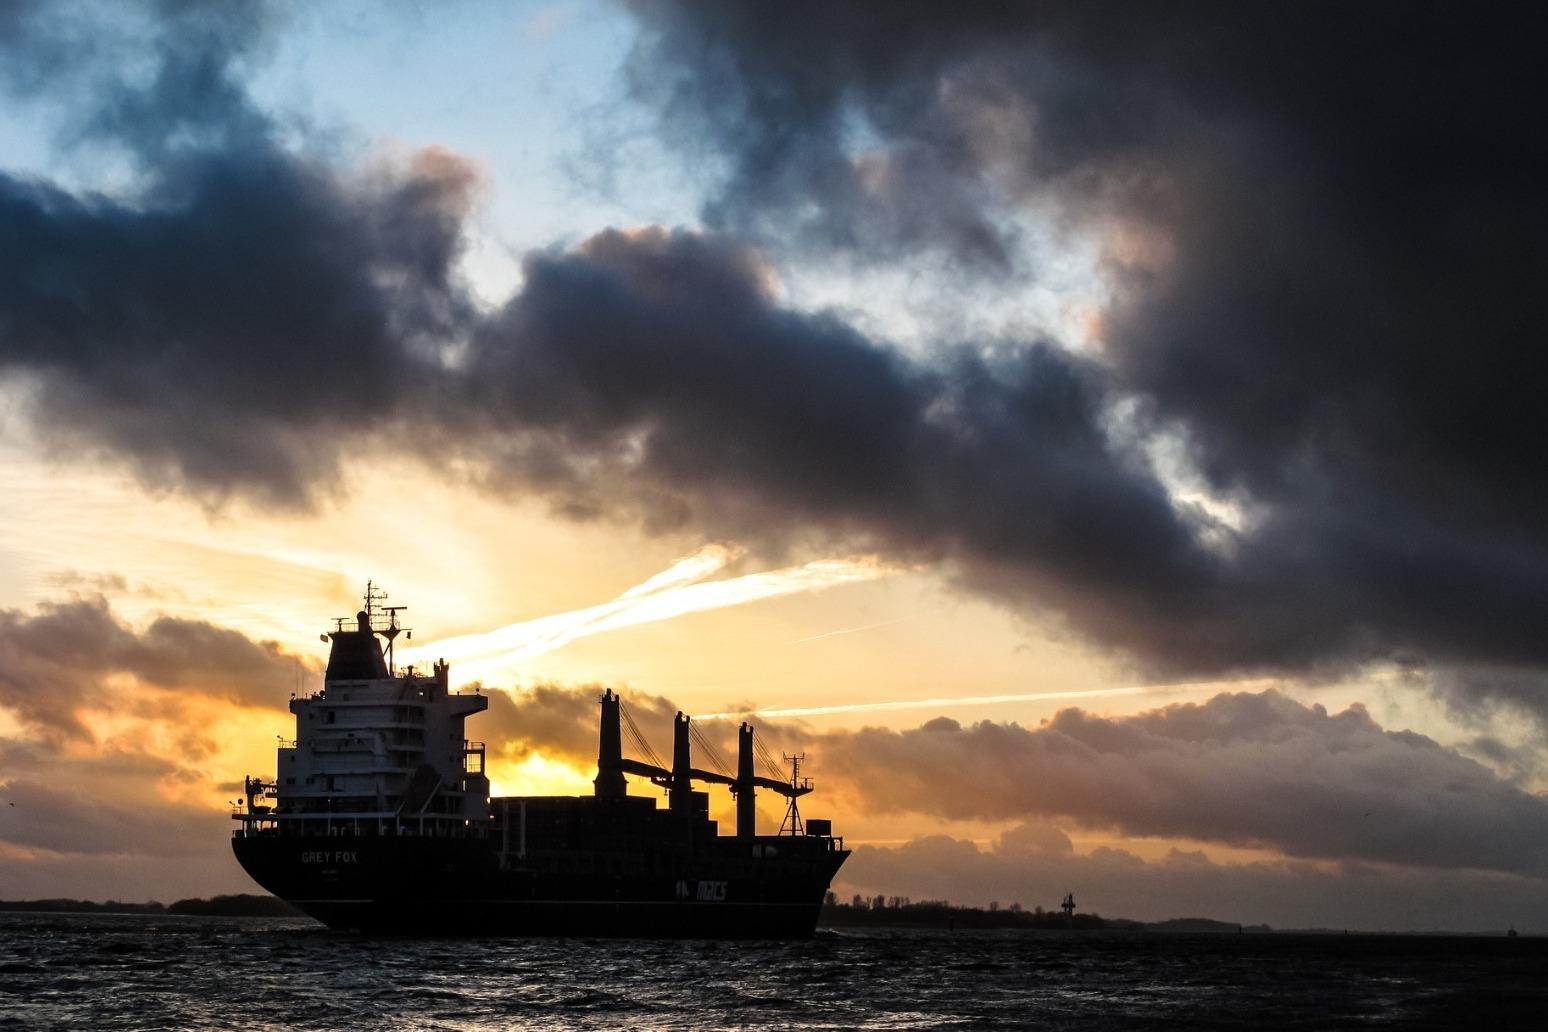 China coast oil tanker in danger of exploding